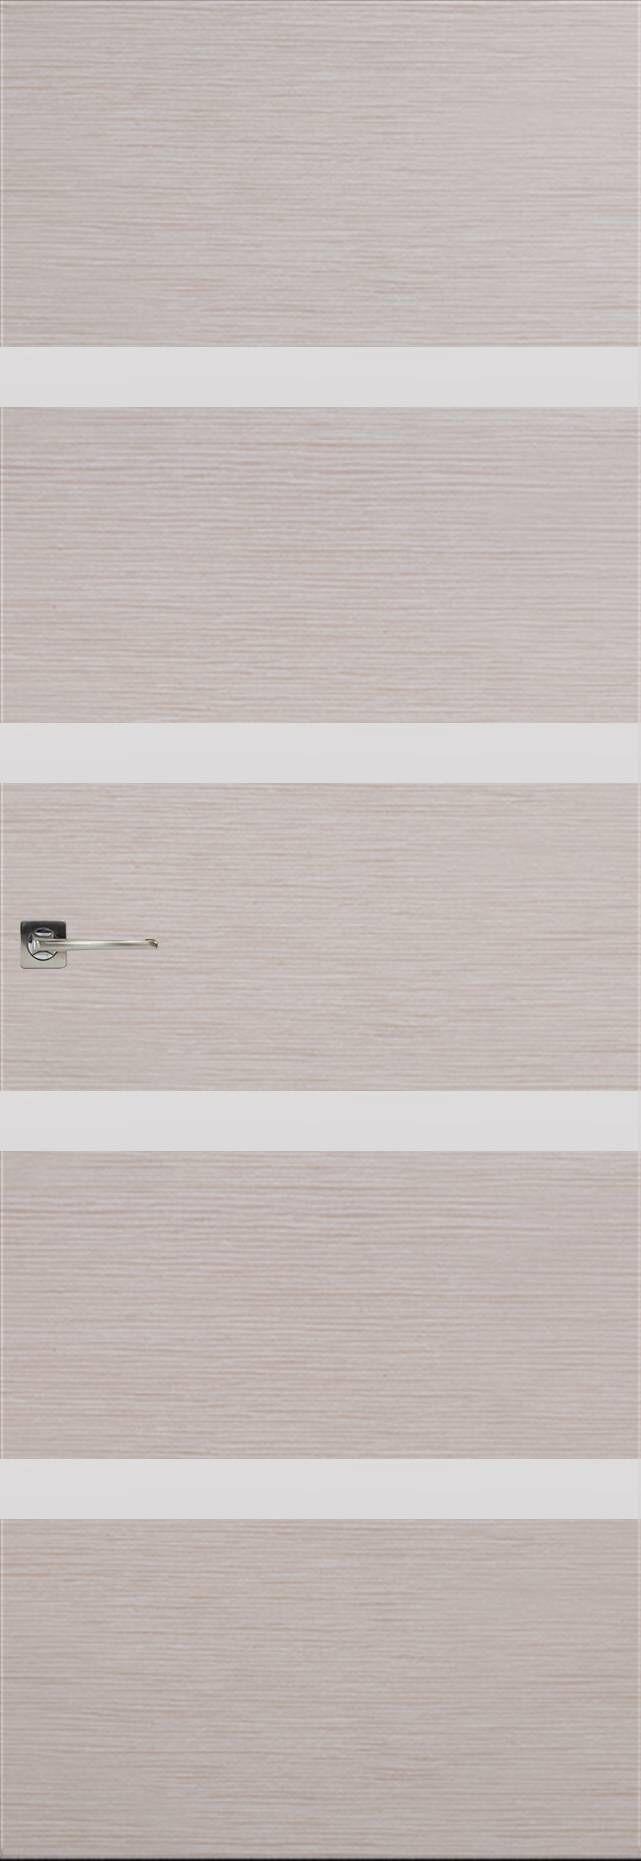 Tivoli Д-4 Invisible цвет - Дымчатый дуб Без стекла (ДГ)